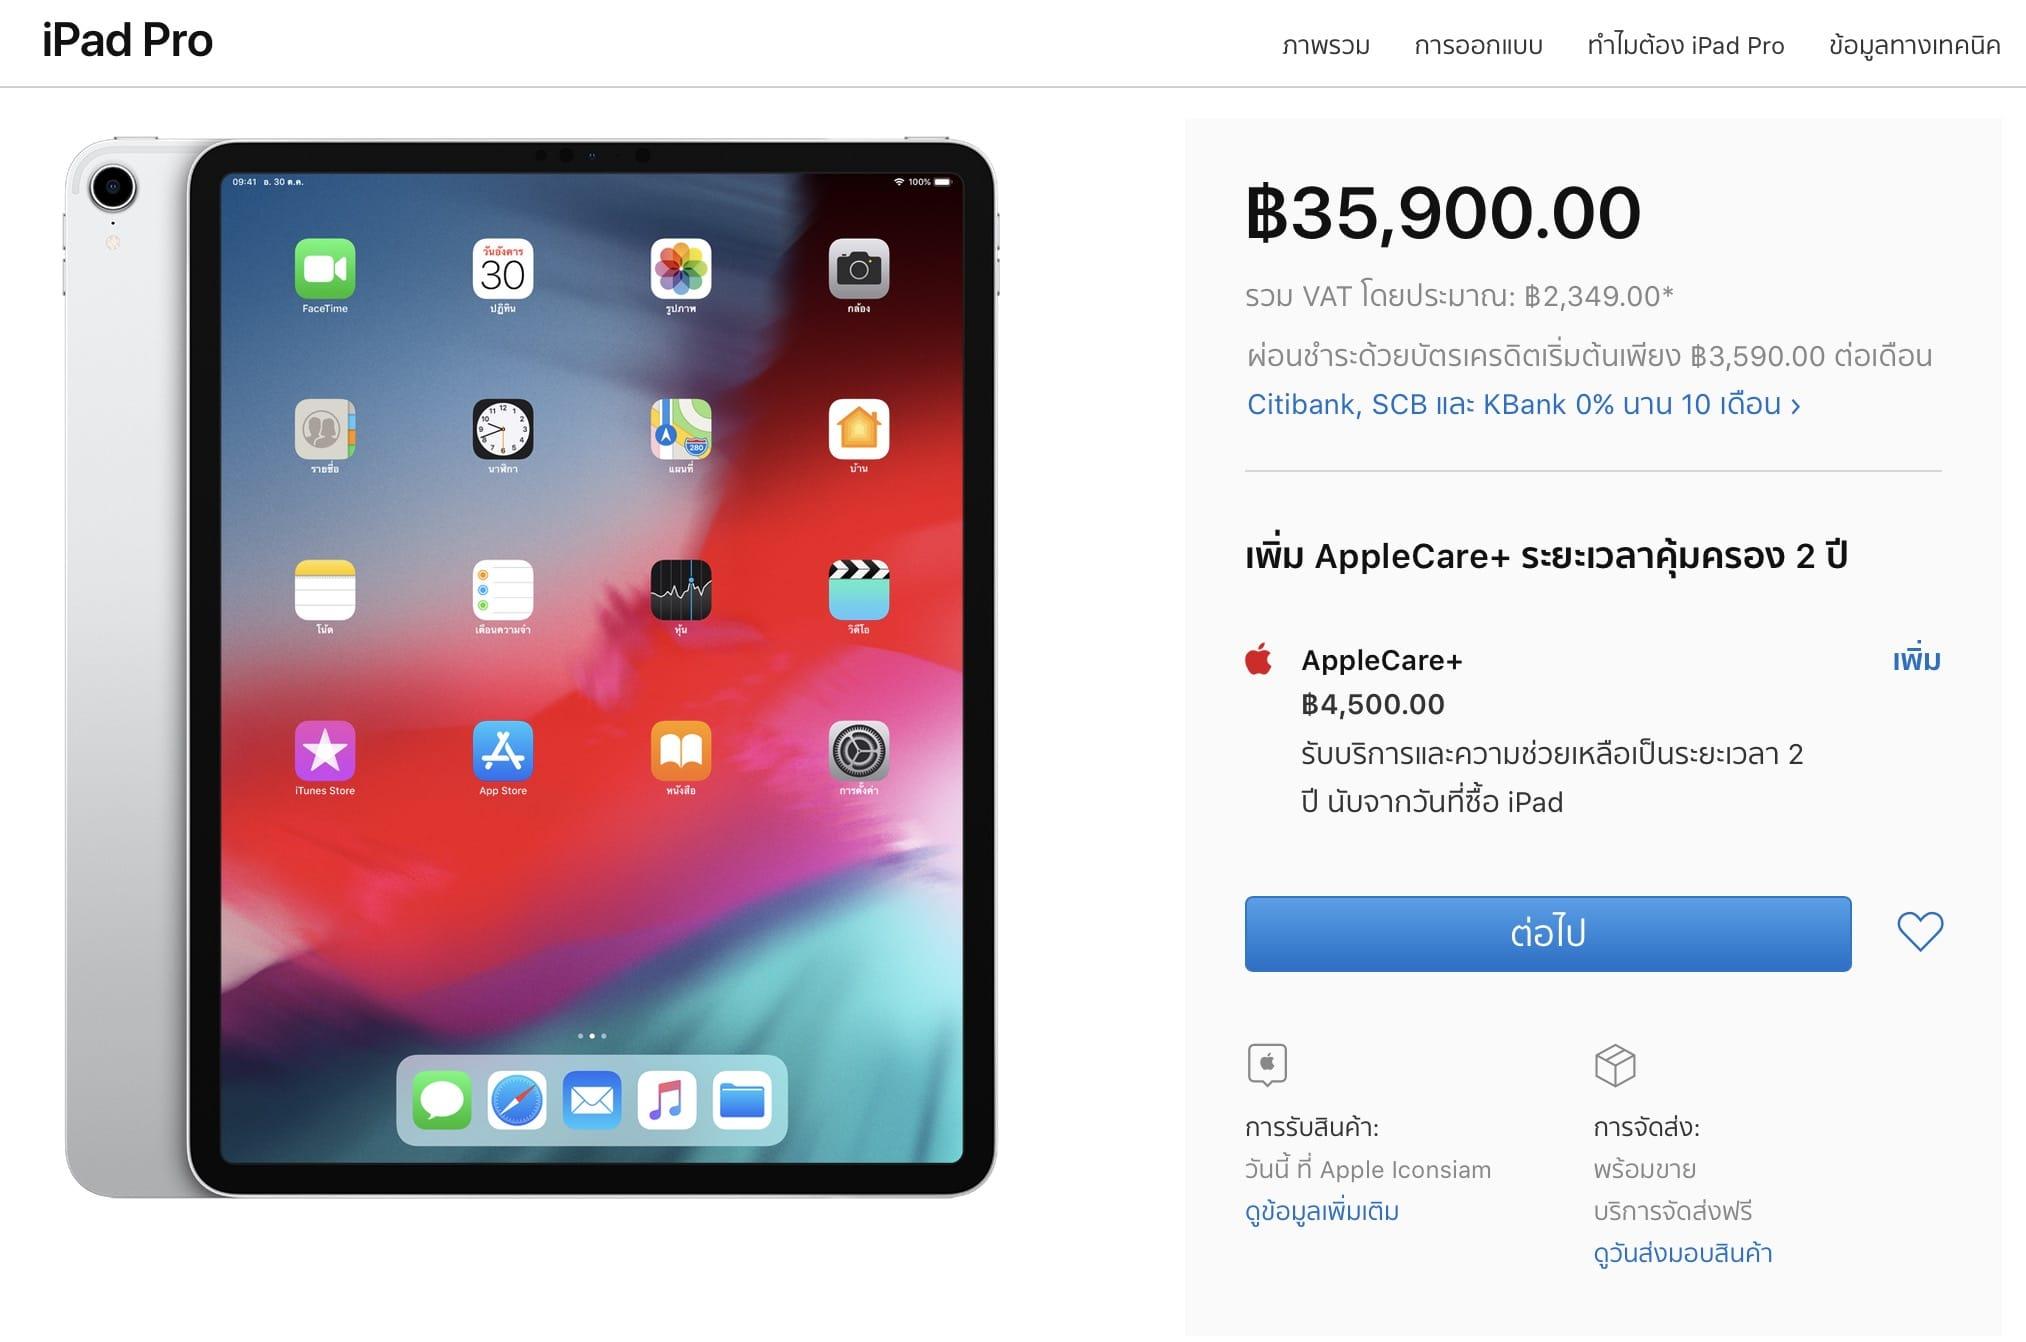 Applecare+ Ipad Pro Thai